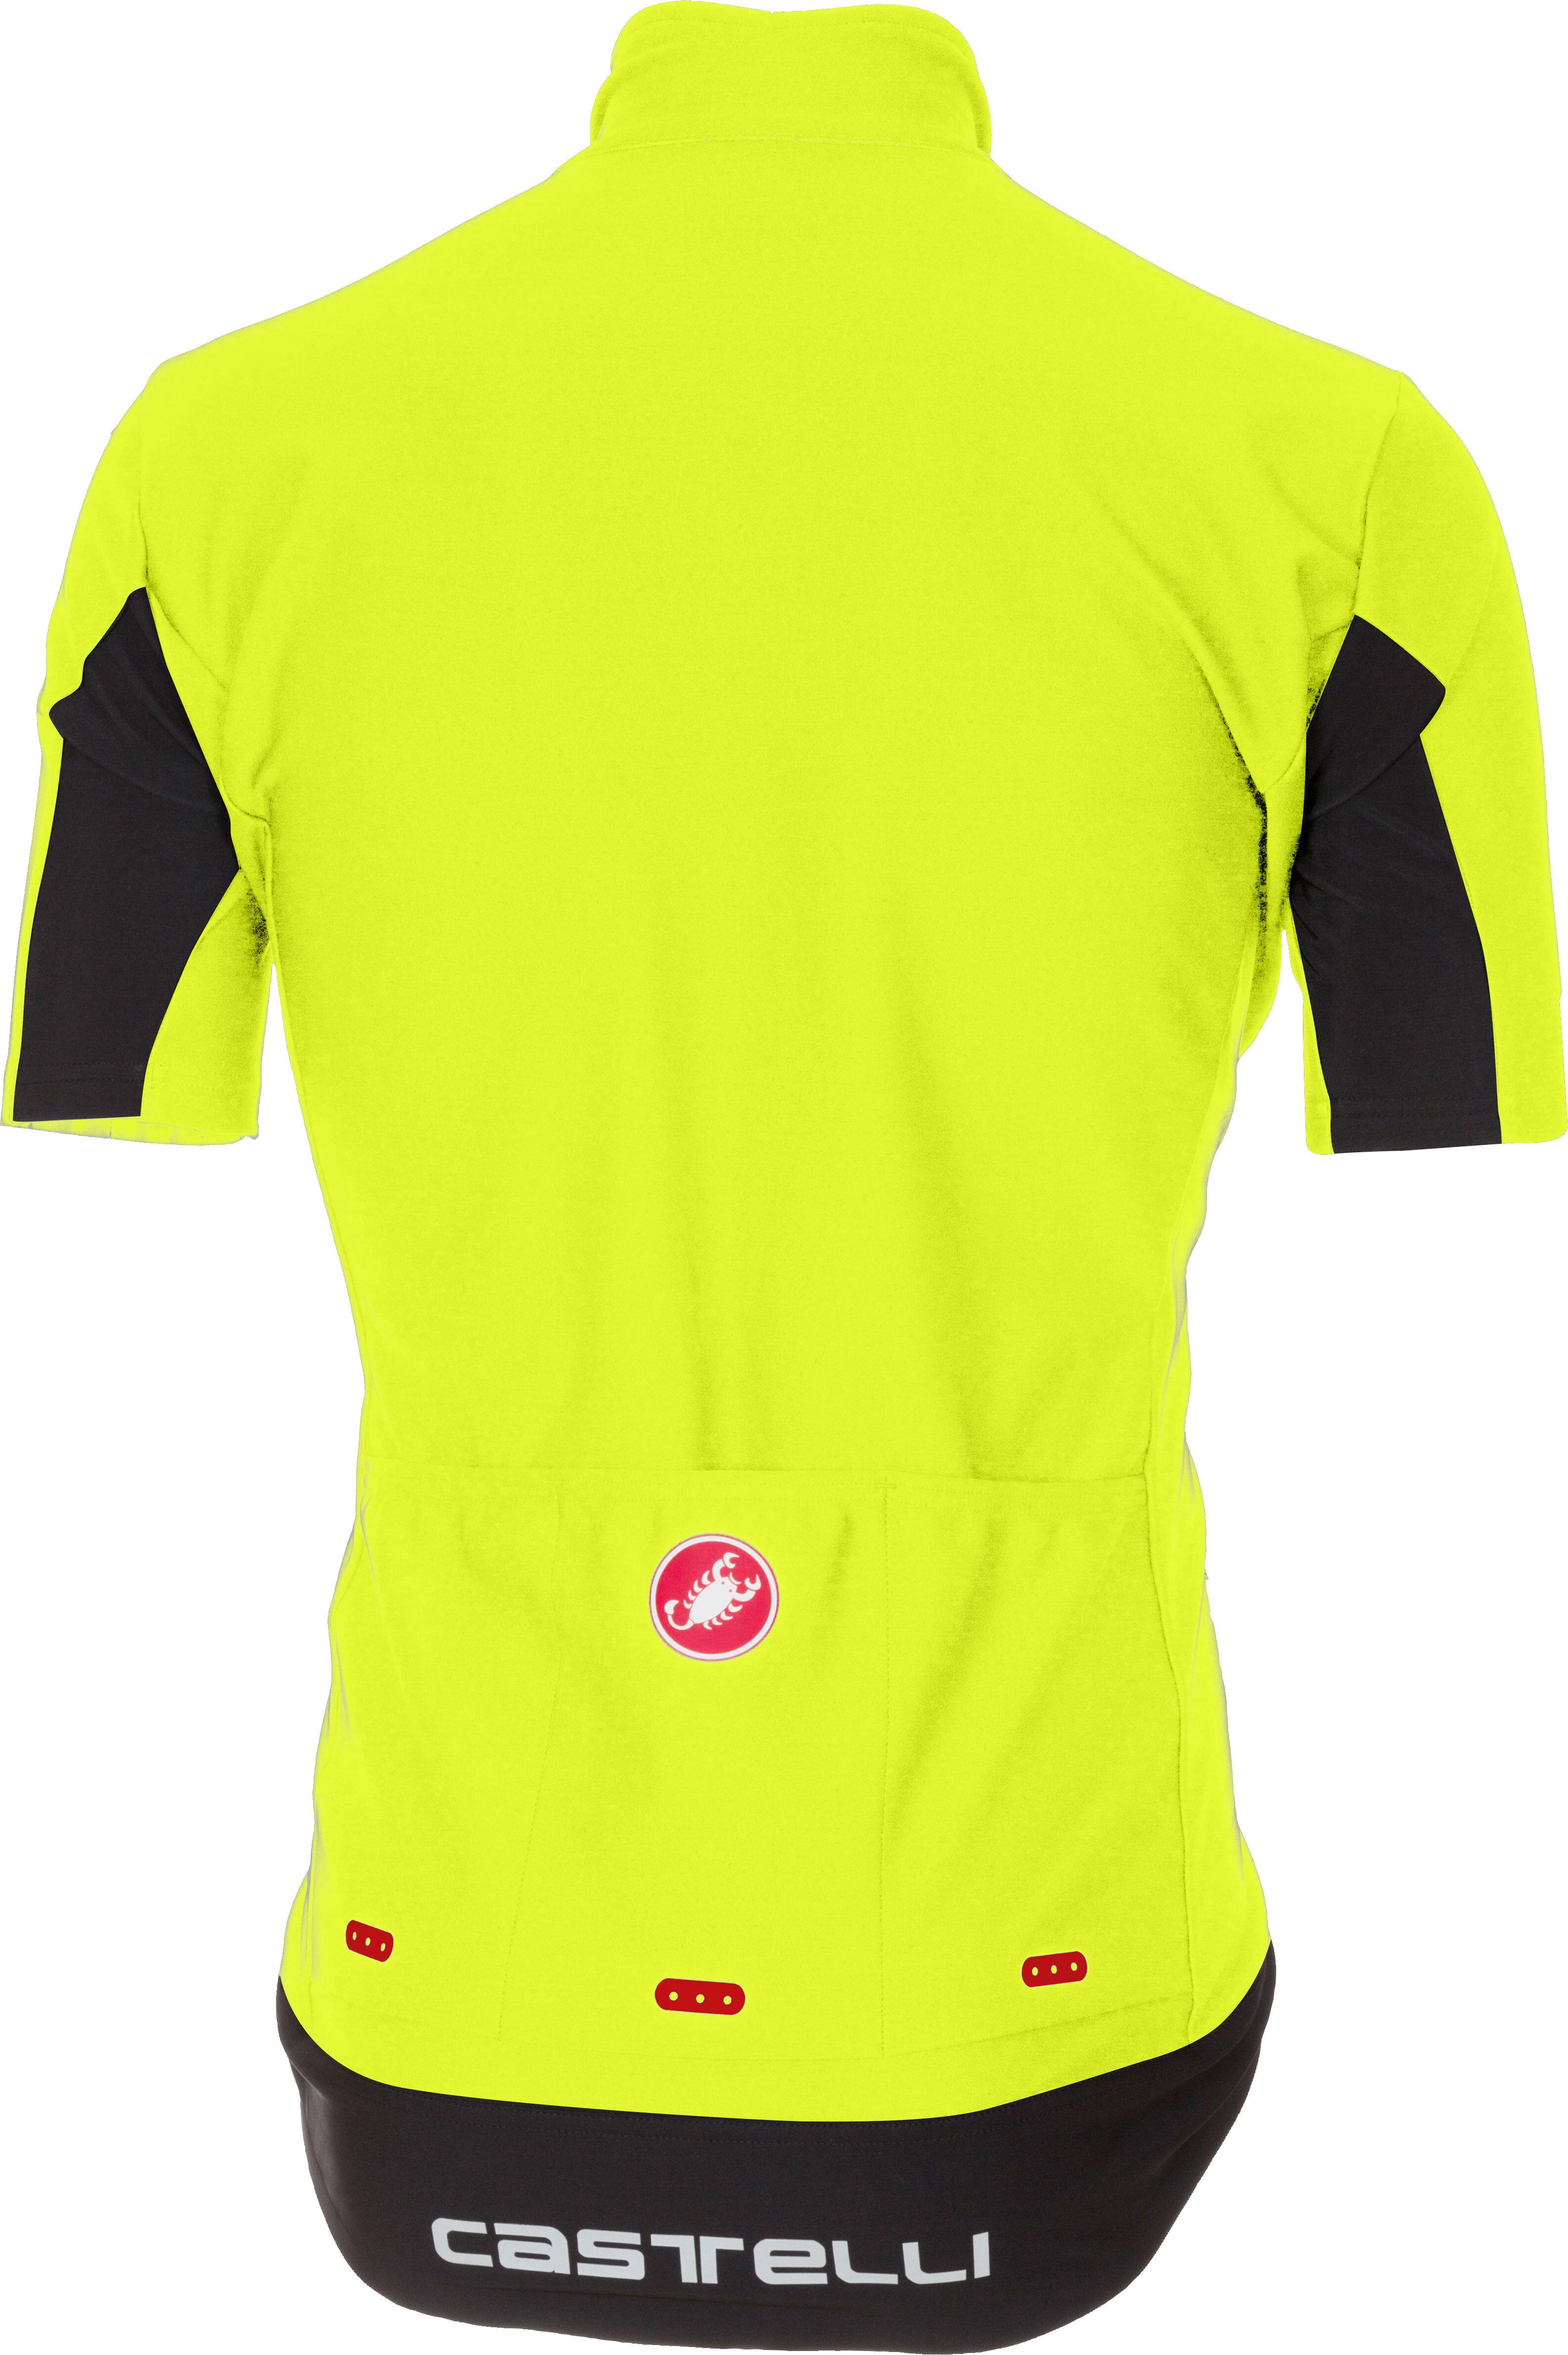 Castelli Gabba 3 Bike Jersey Shortsleeve Men yellow at Bikester.co.uk b7eef452a